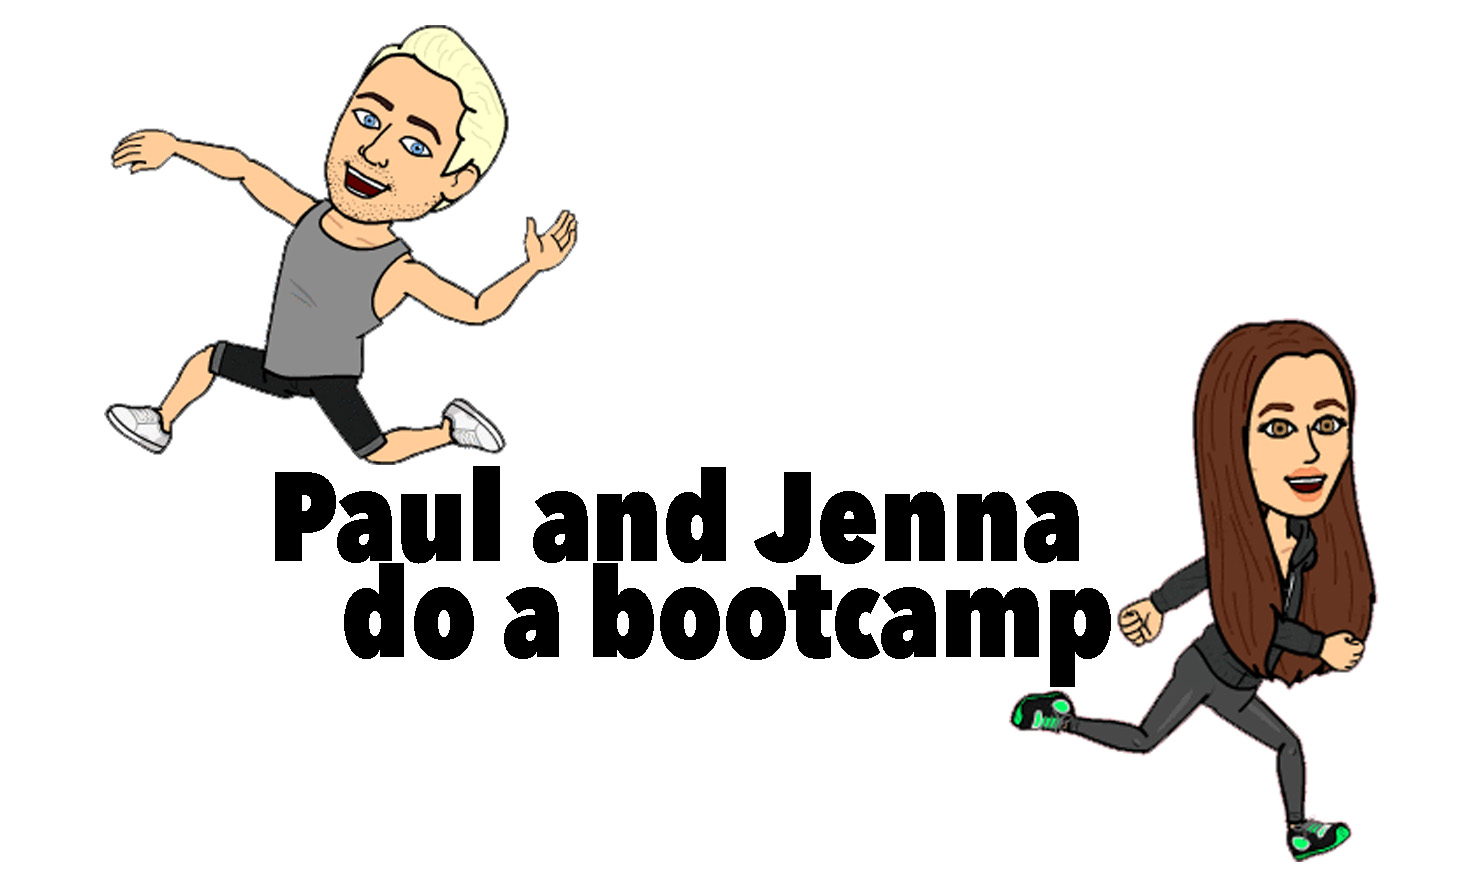 Paul and Jenna do a bootcamp logo